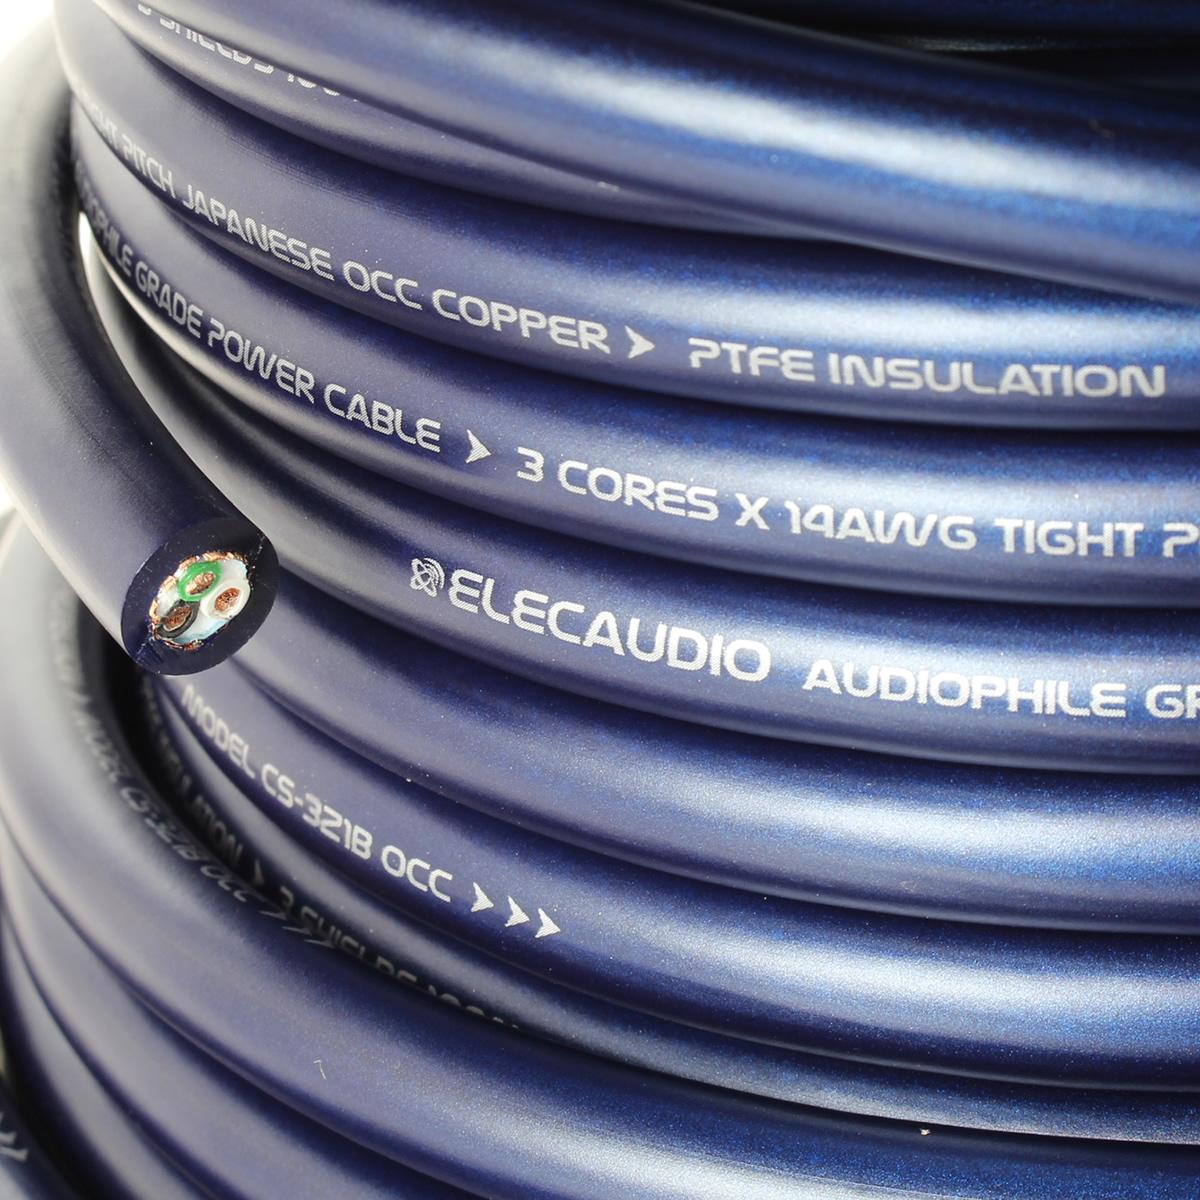 ELECAUDIO CS-321B OCC 3x2.50mm²